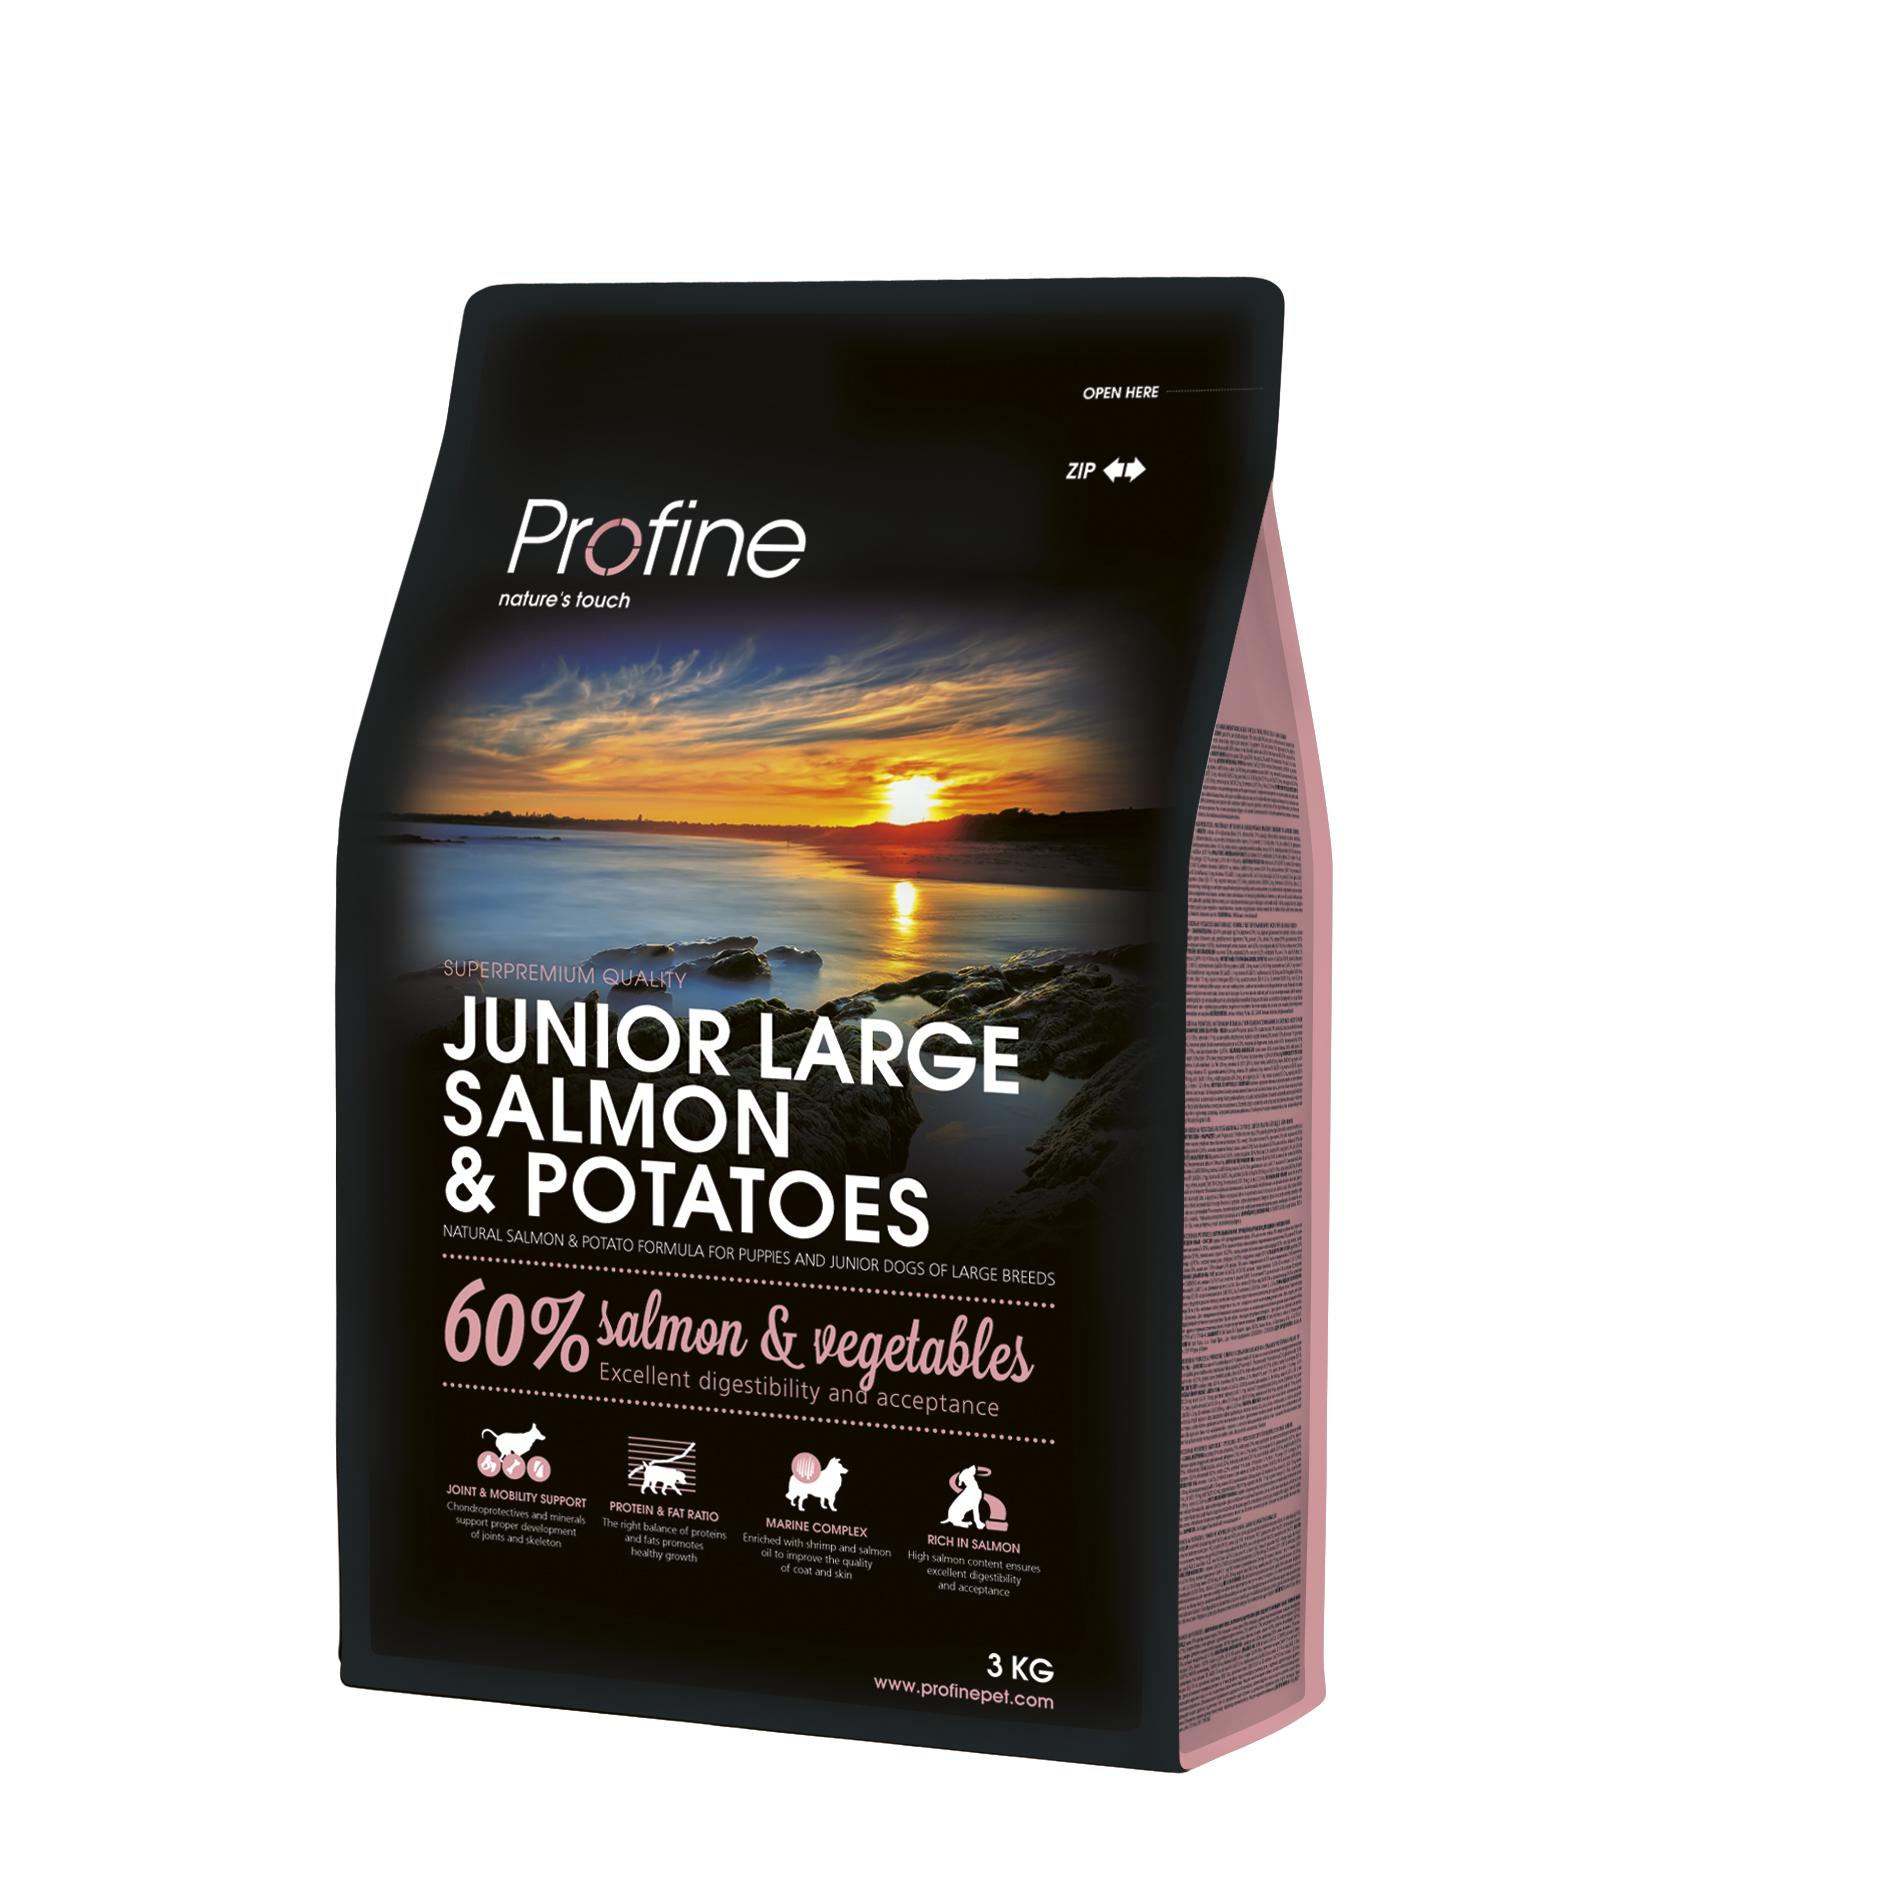 Profine Junior Large Breed Salmon & Potatoes 3kg